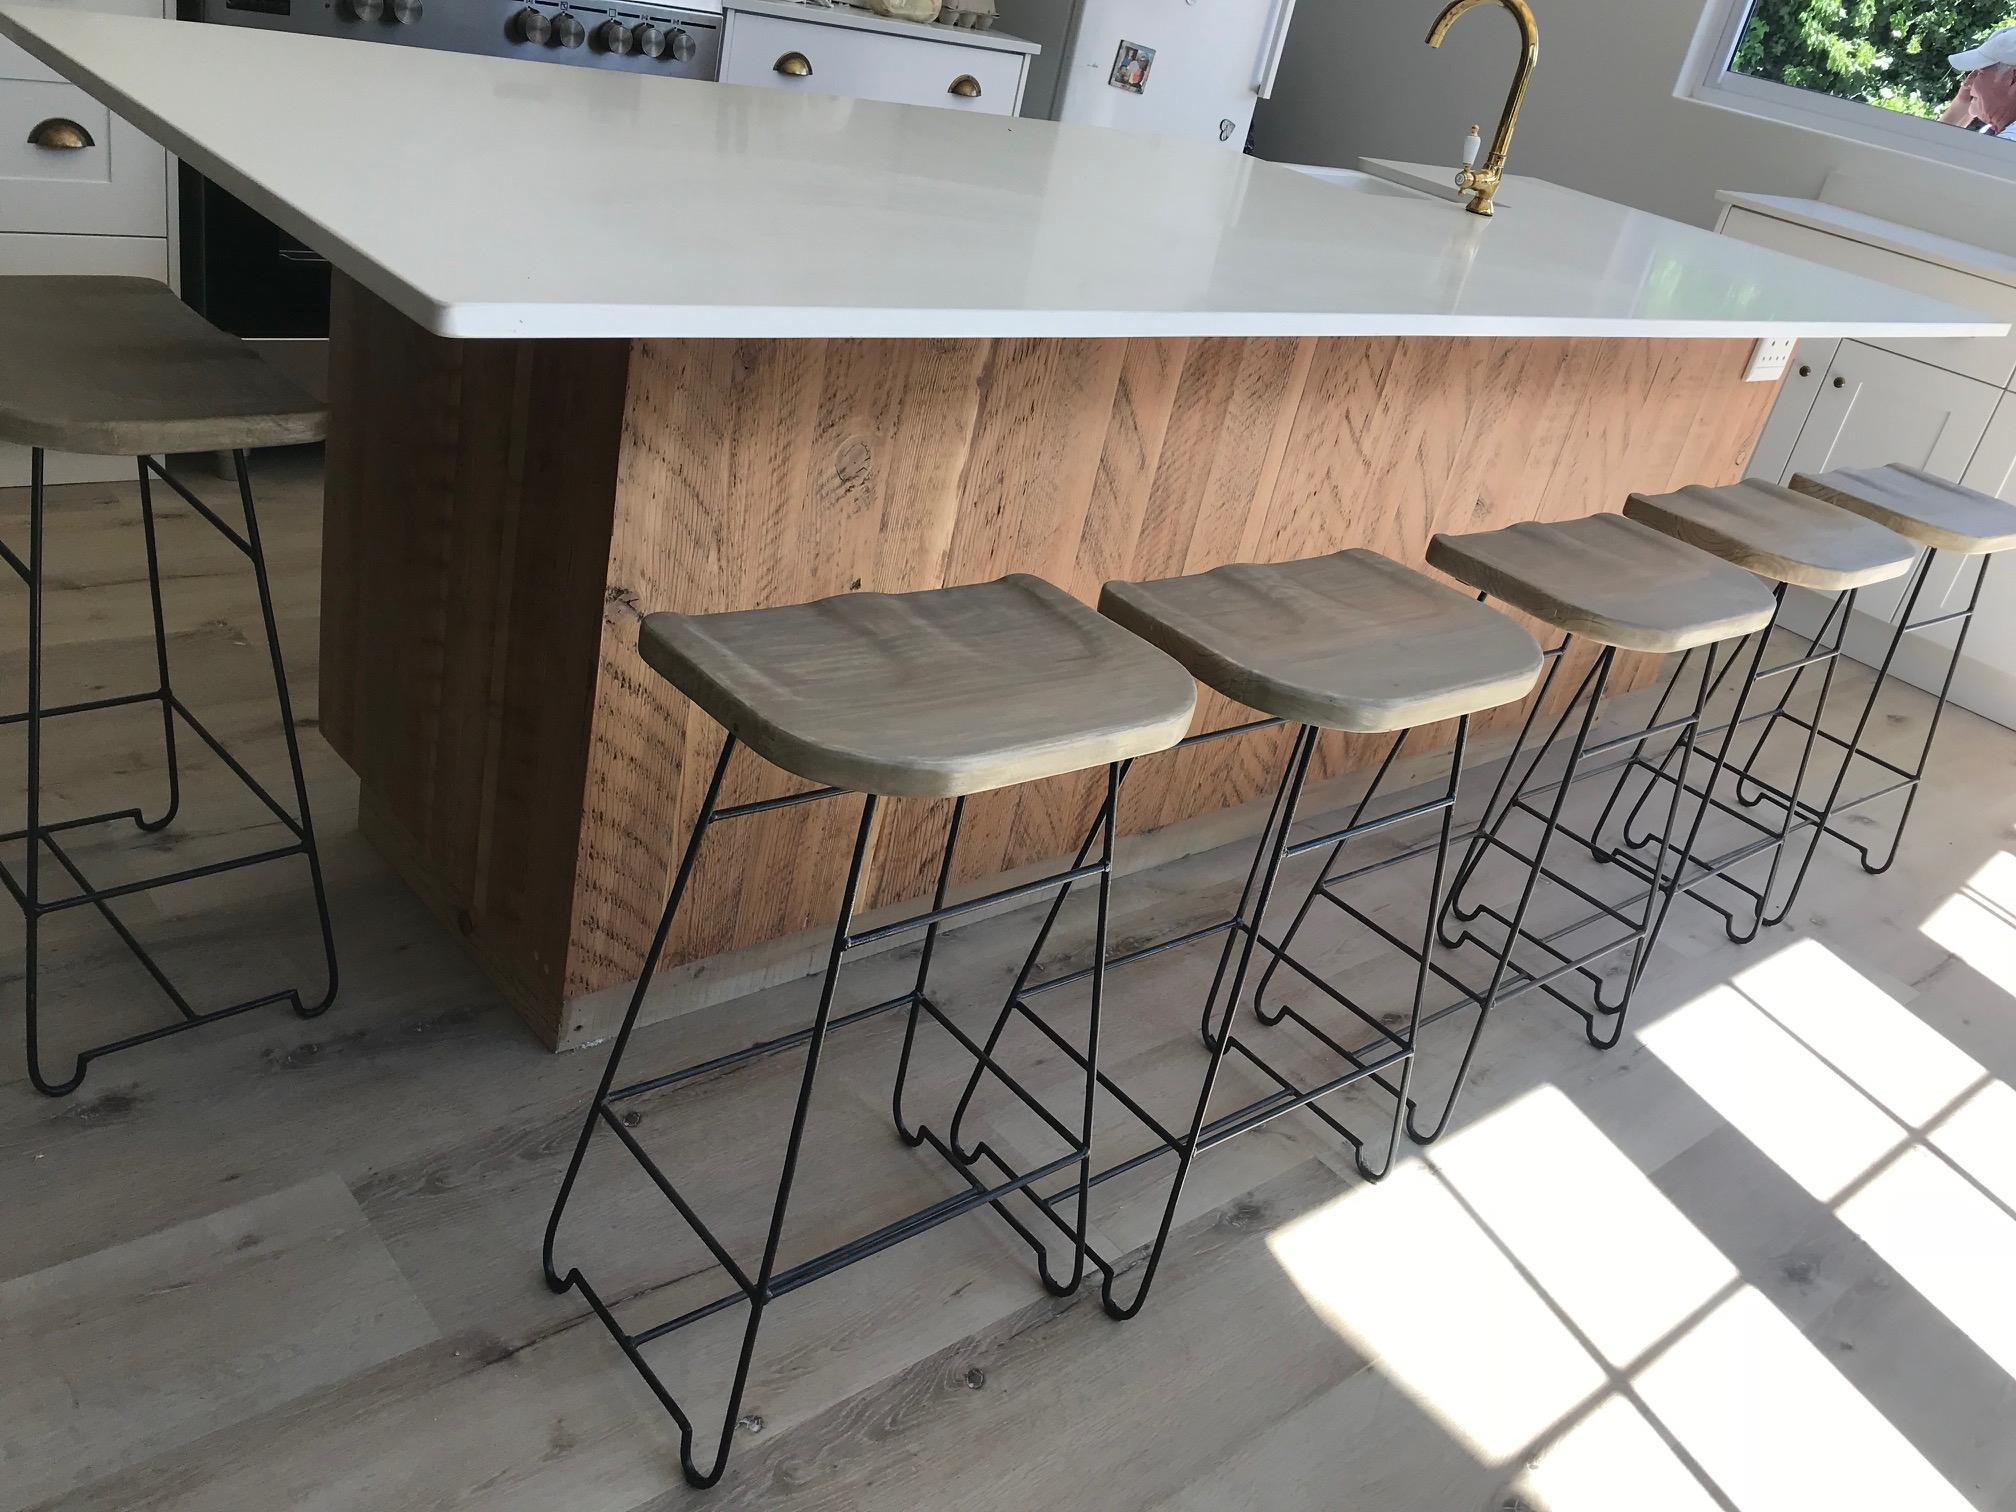 Steel bar stools